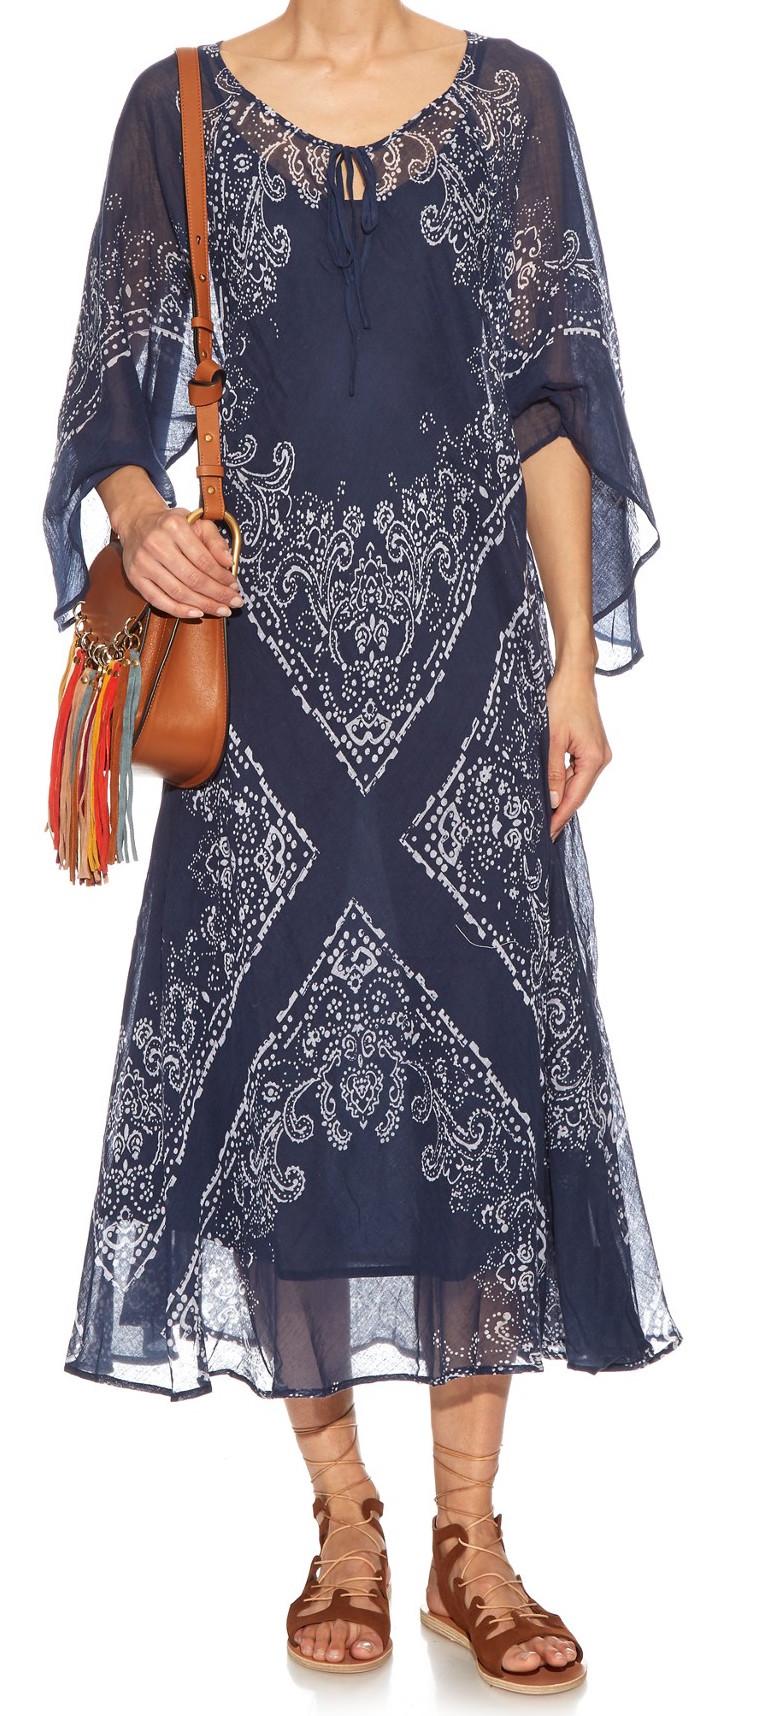 MES DEMOISELLES 'BONITA' BANDANA PRINT DRESS